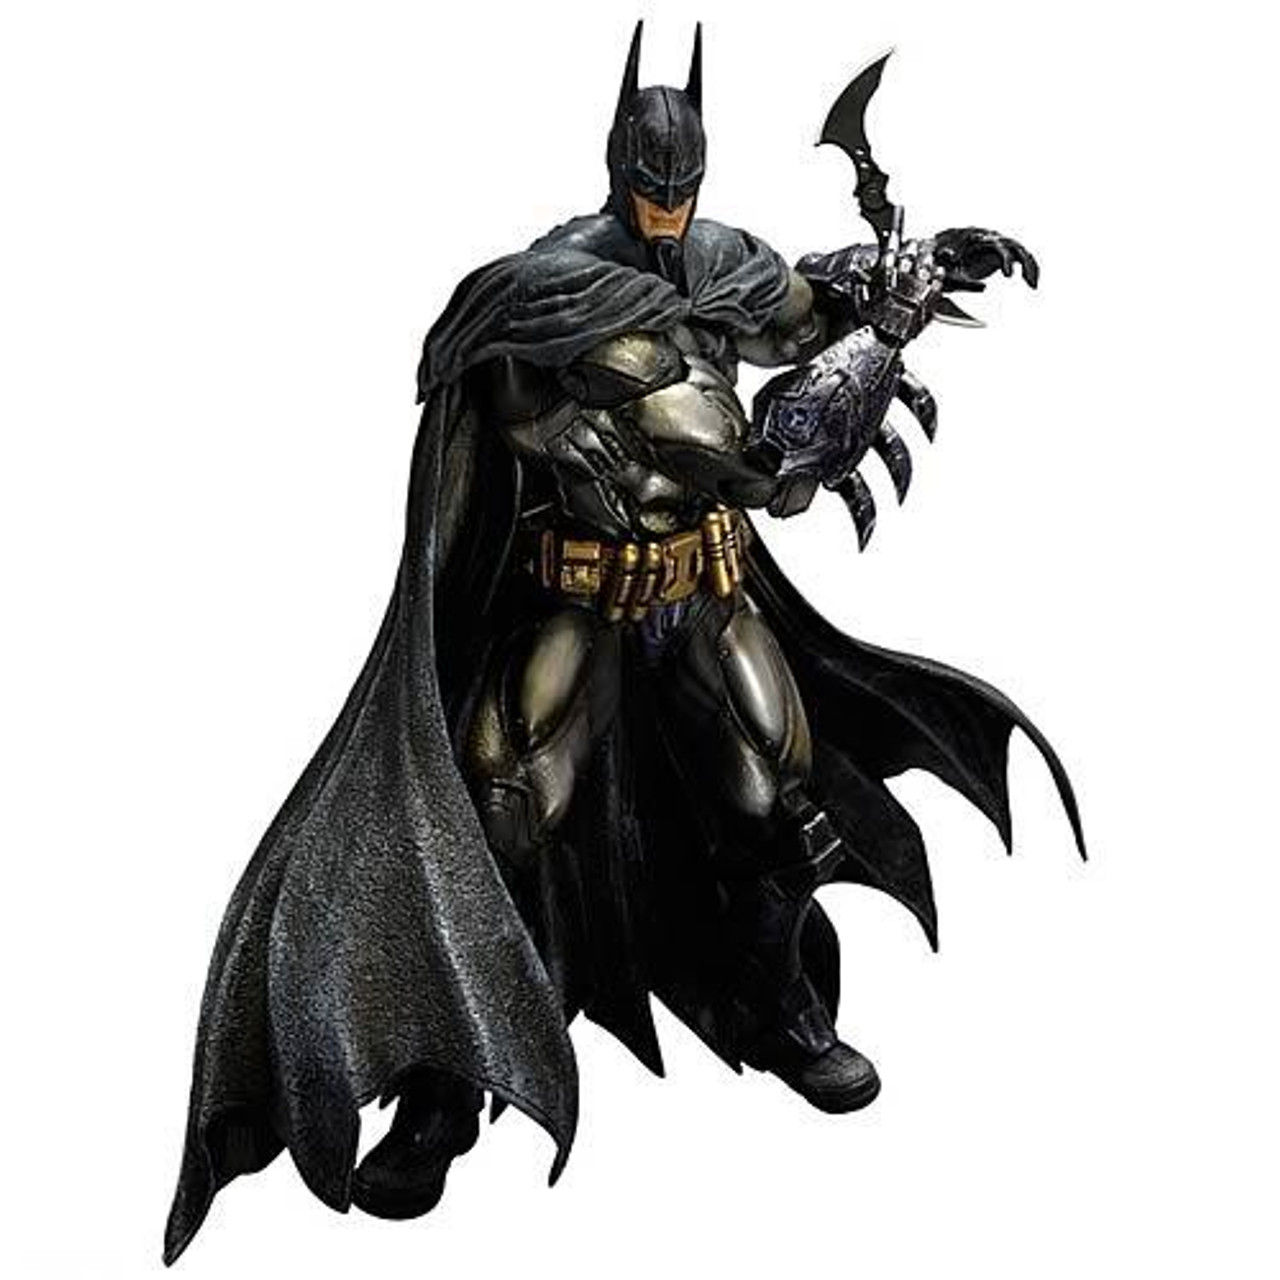 Arkham Asylum Play Arts Kai Armored Batman Action Figure